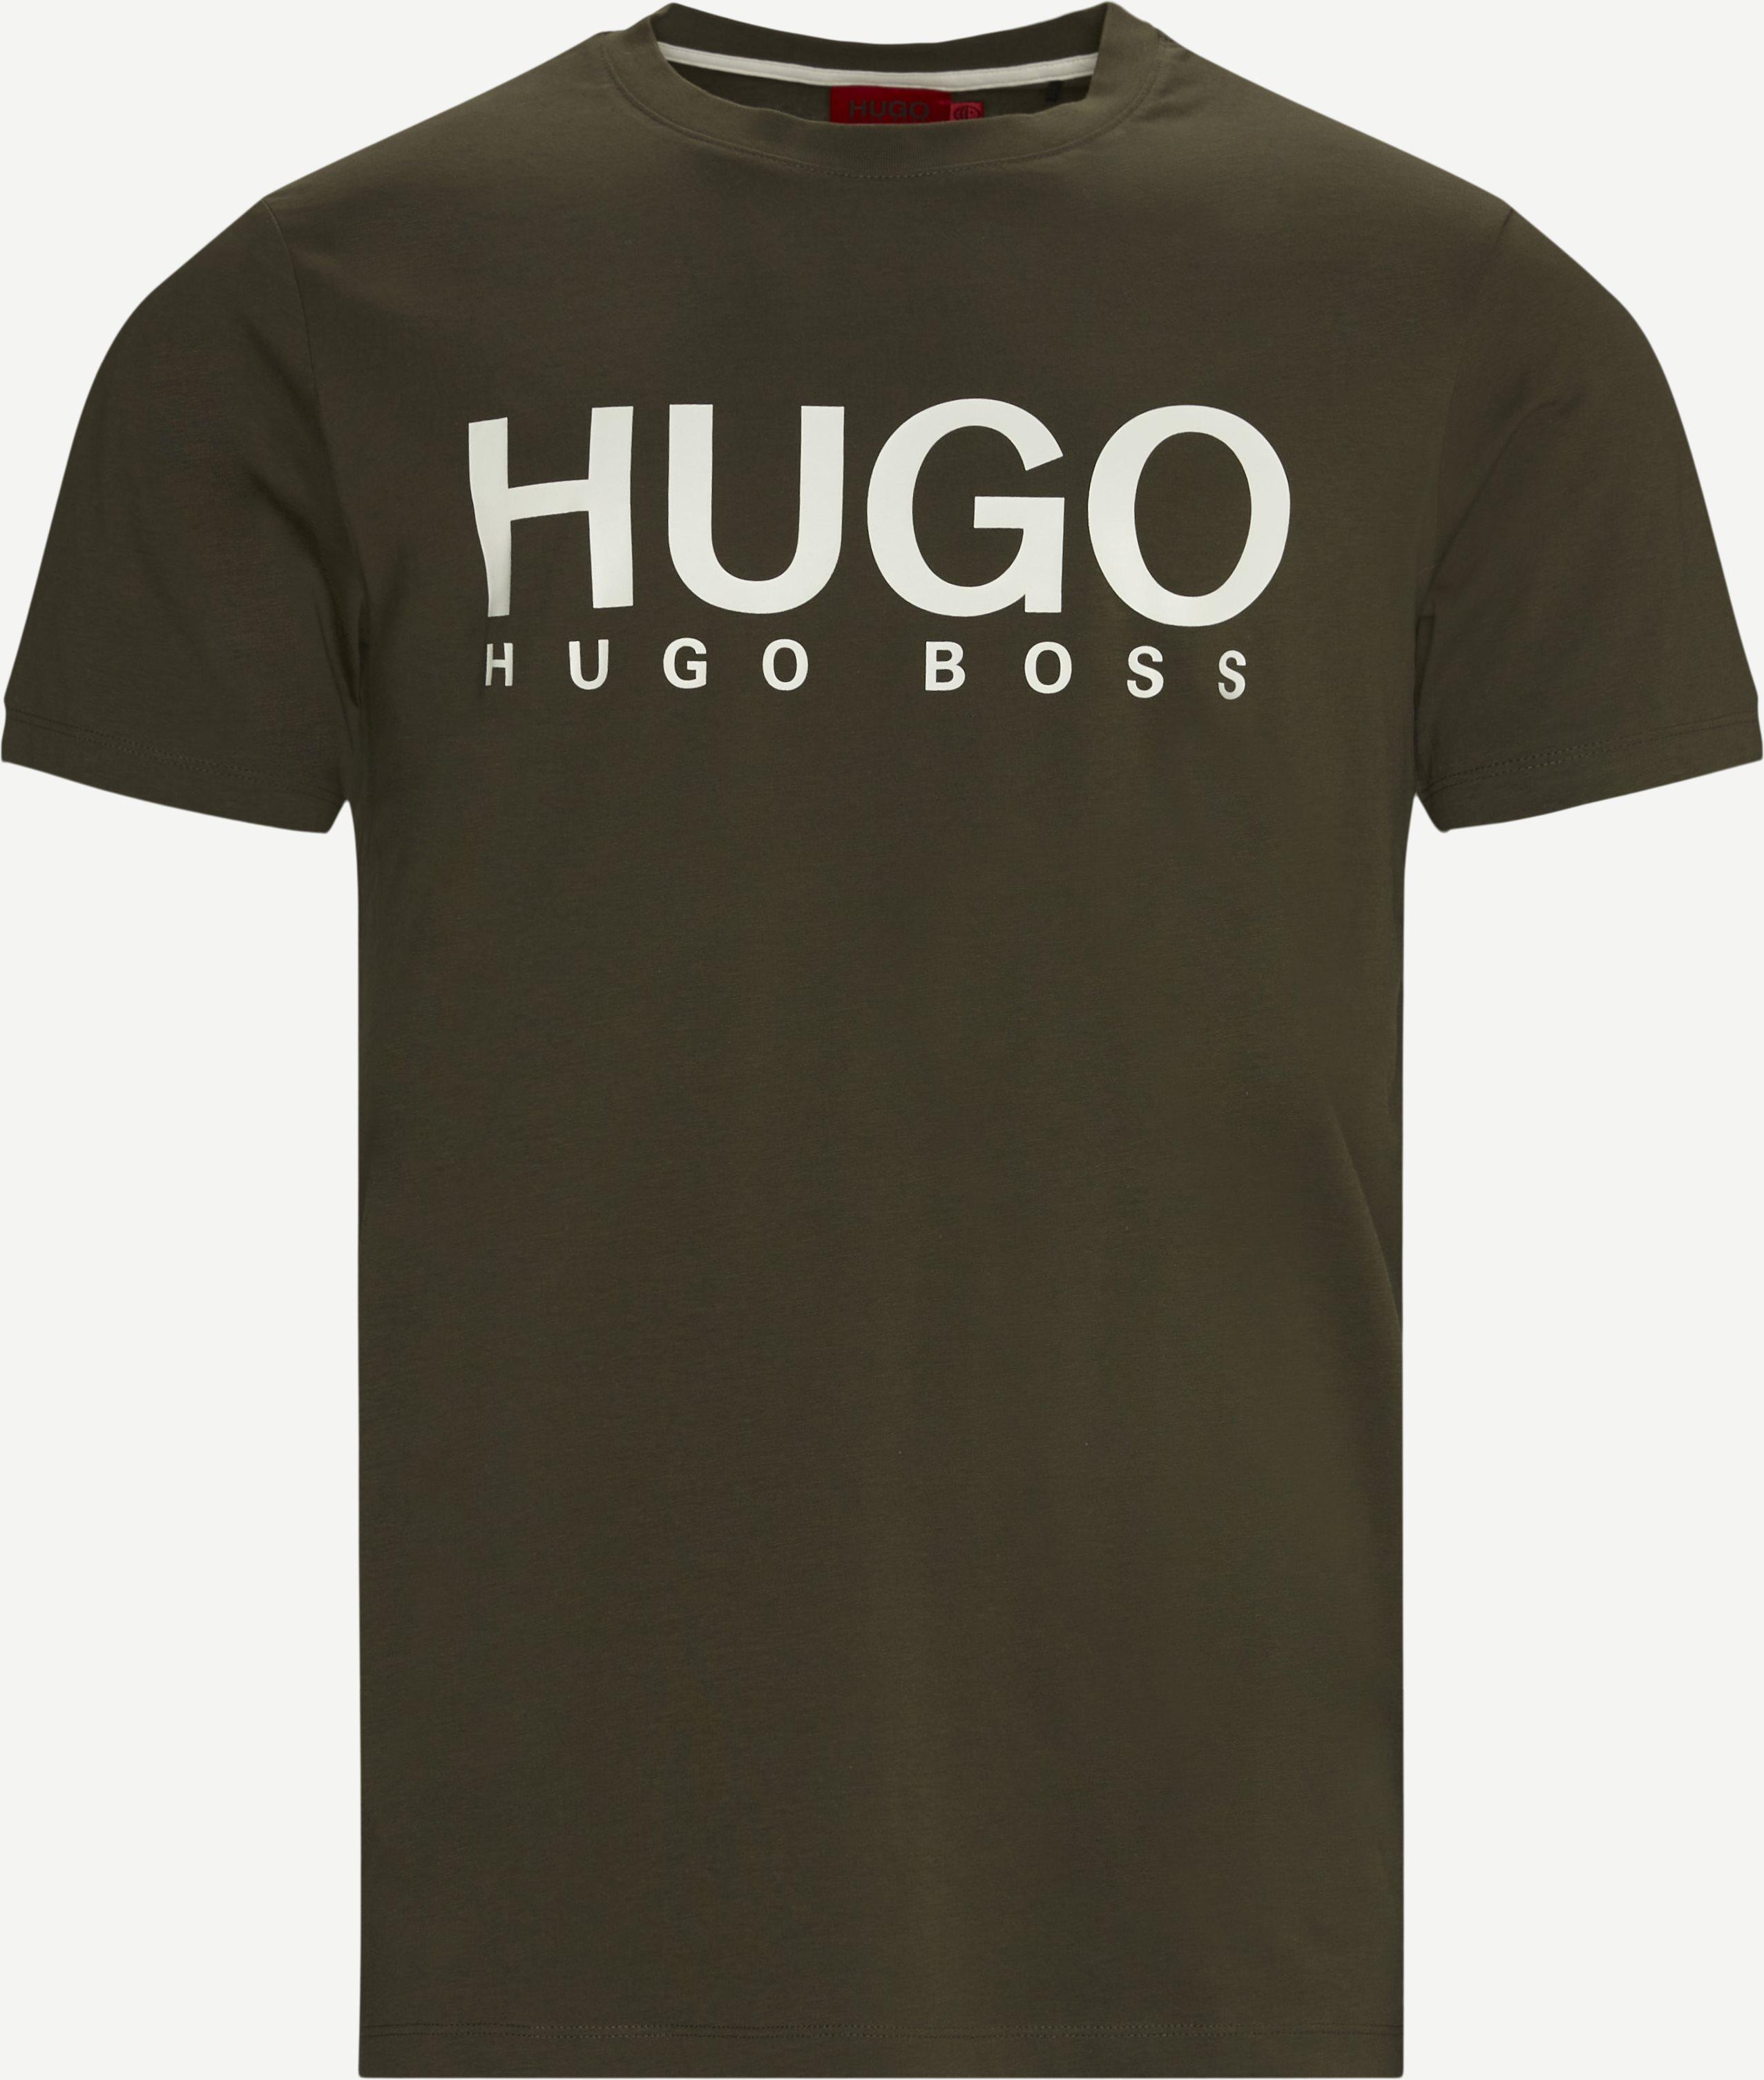 Dolive T-shirt - T-shirts - Regular - Grön